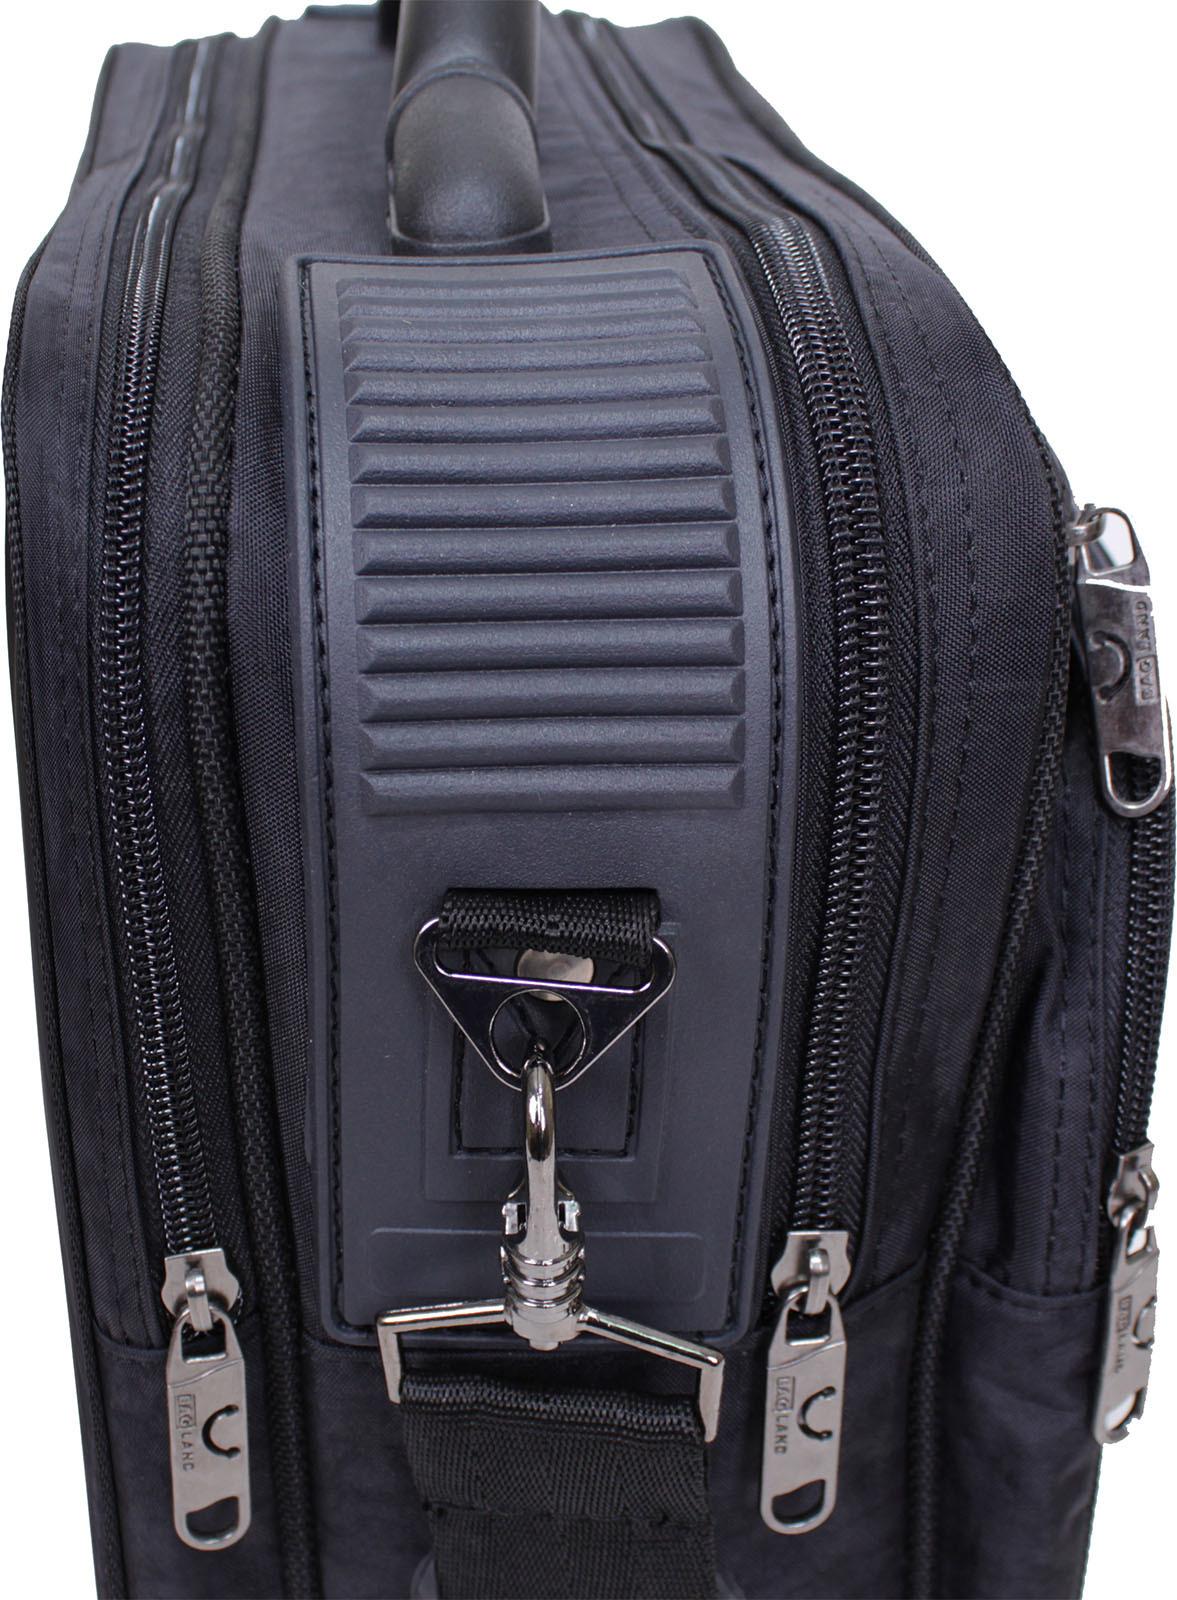 ae75b9a69c8a Мужская сумка Bagland Mr.Green 16 л. Чёрный (0025270)